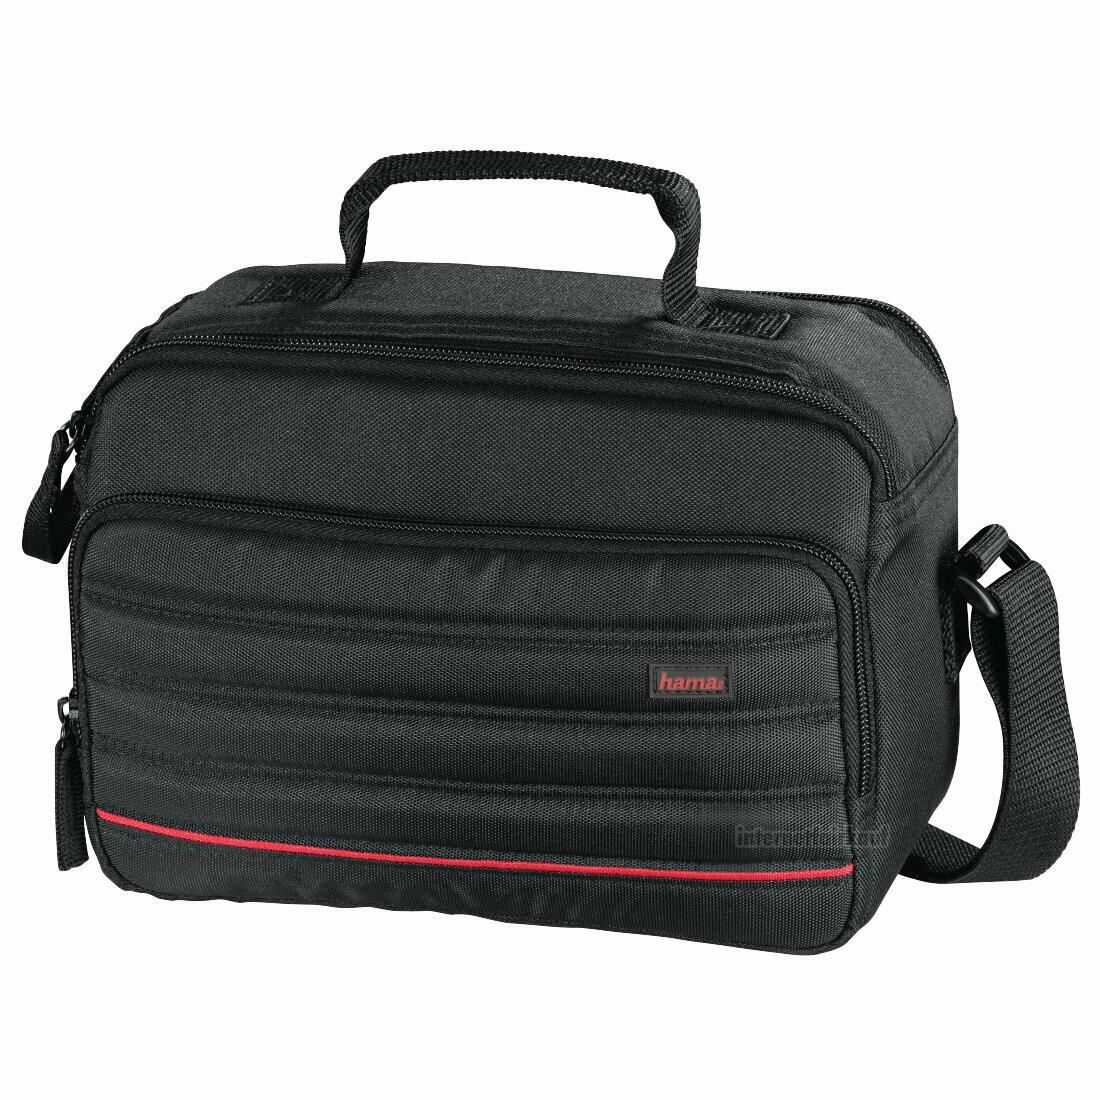 Fototasche Kameratasche passend für Nikon D3300 D3200 D3100